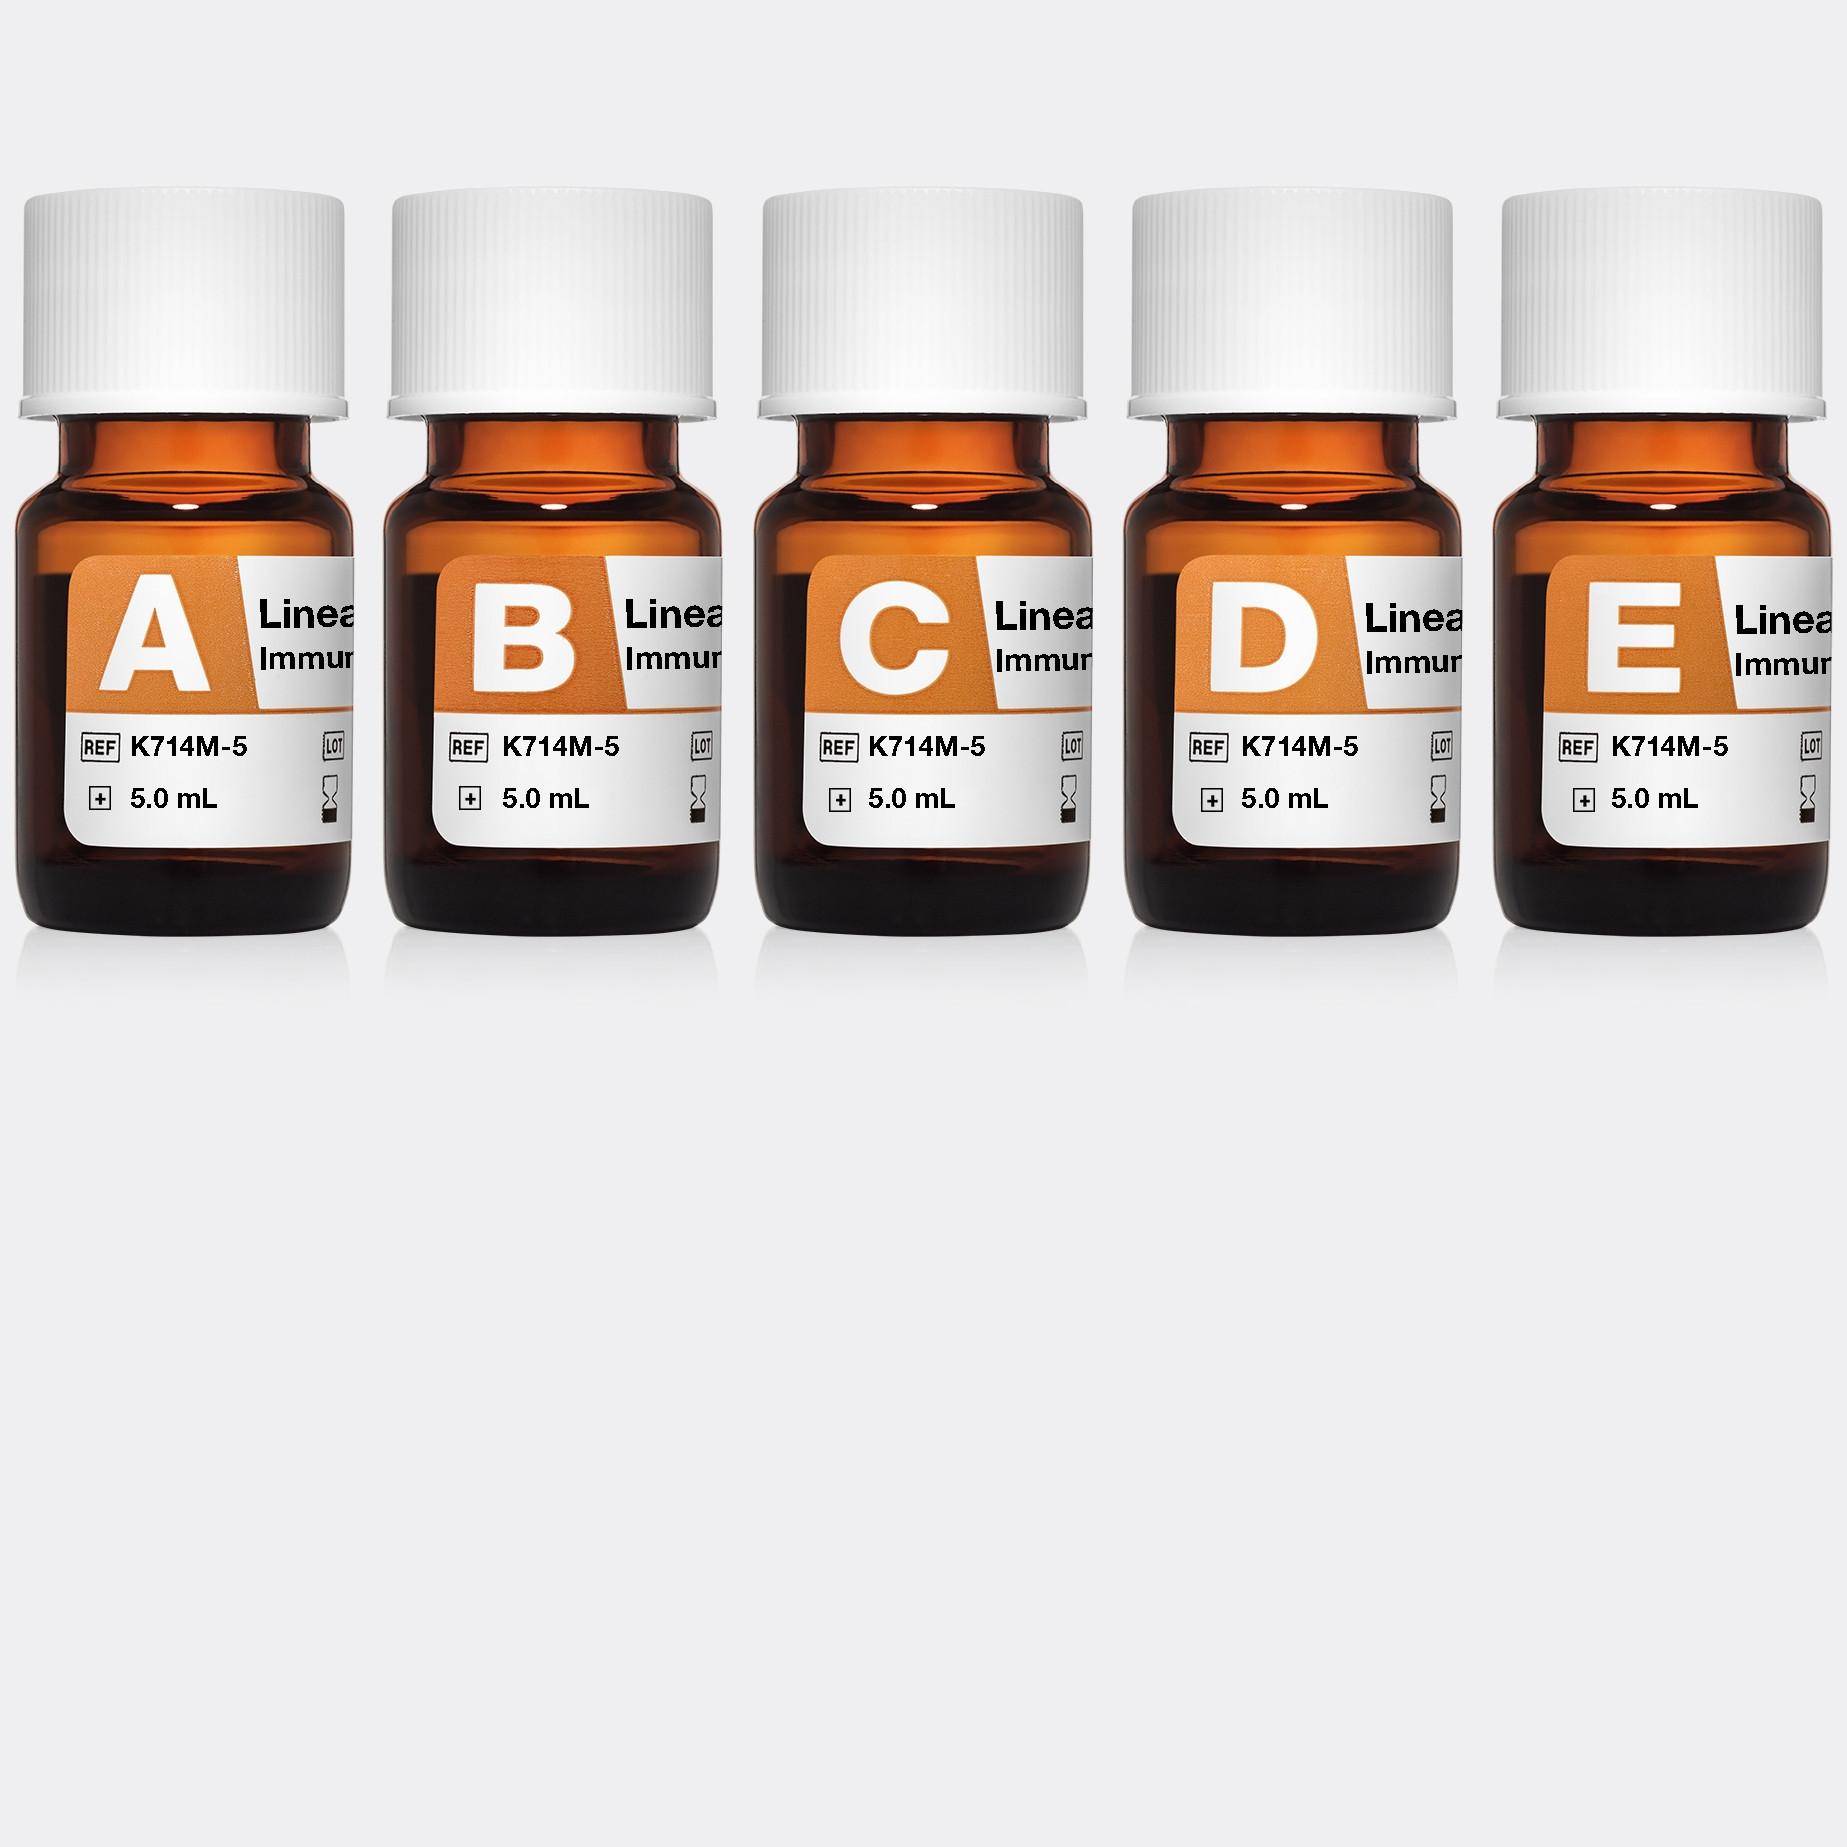 Linearity FD Immunoassay